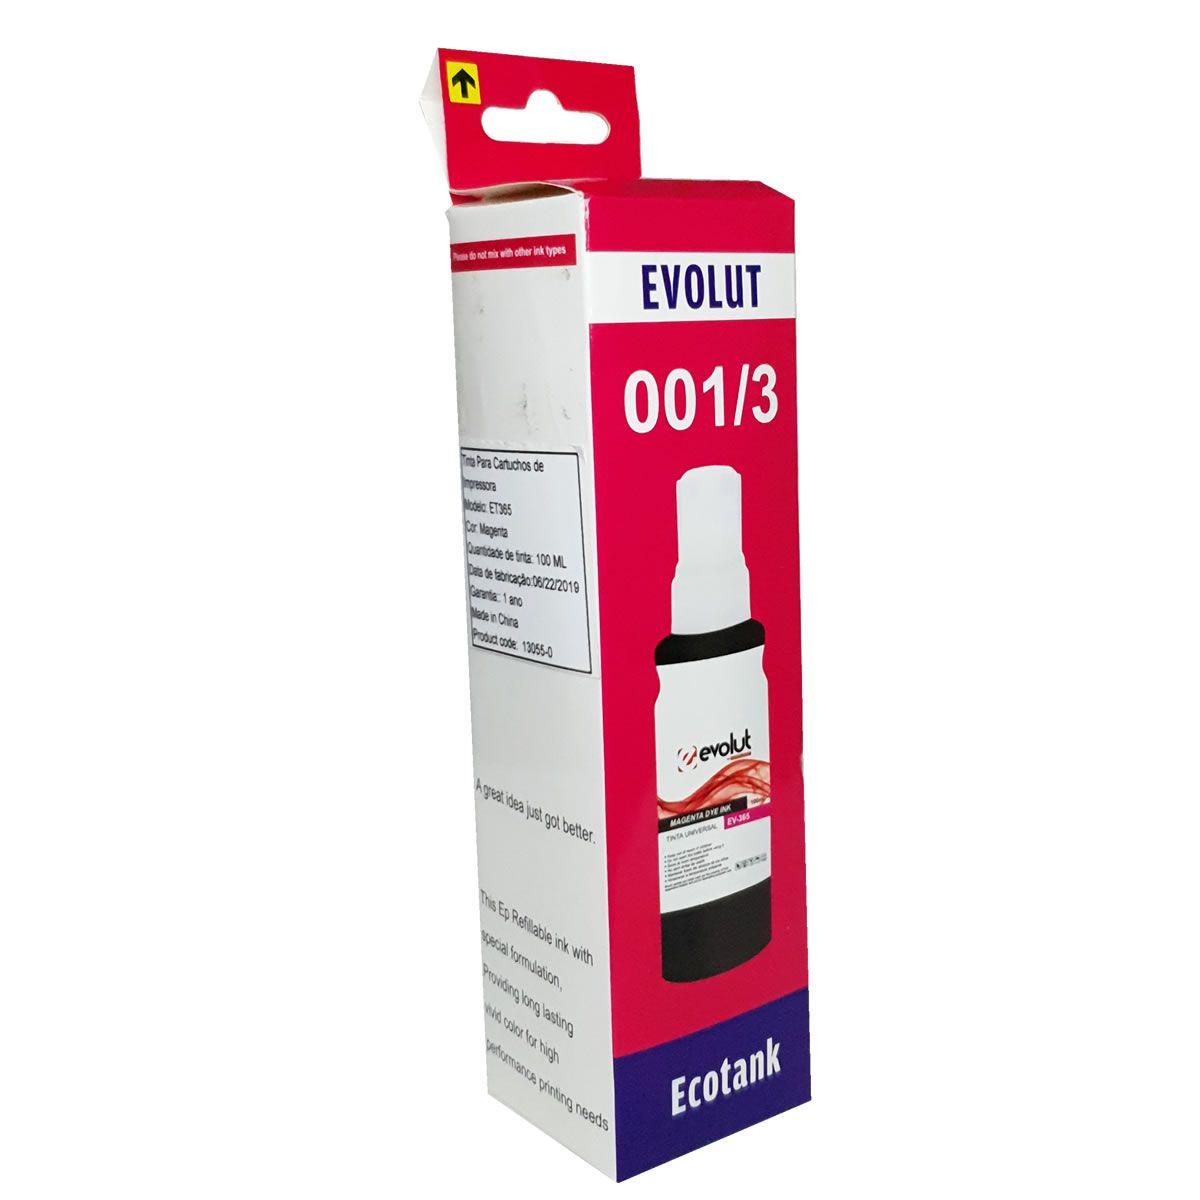 Refil de tinta T664320 Magenta Compatível com ecotank L375 L395 L1300 da Epson